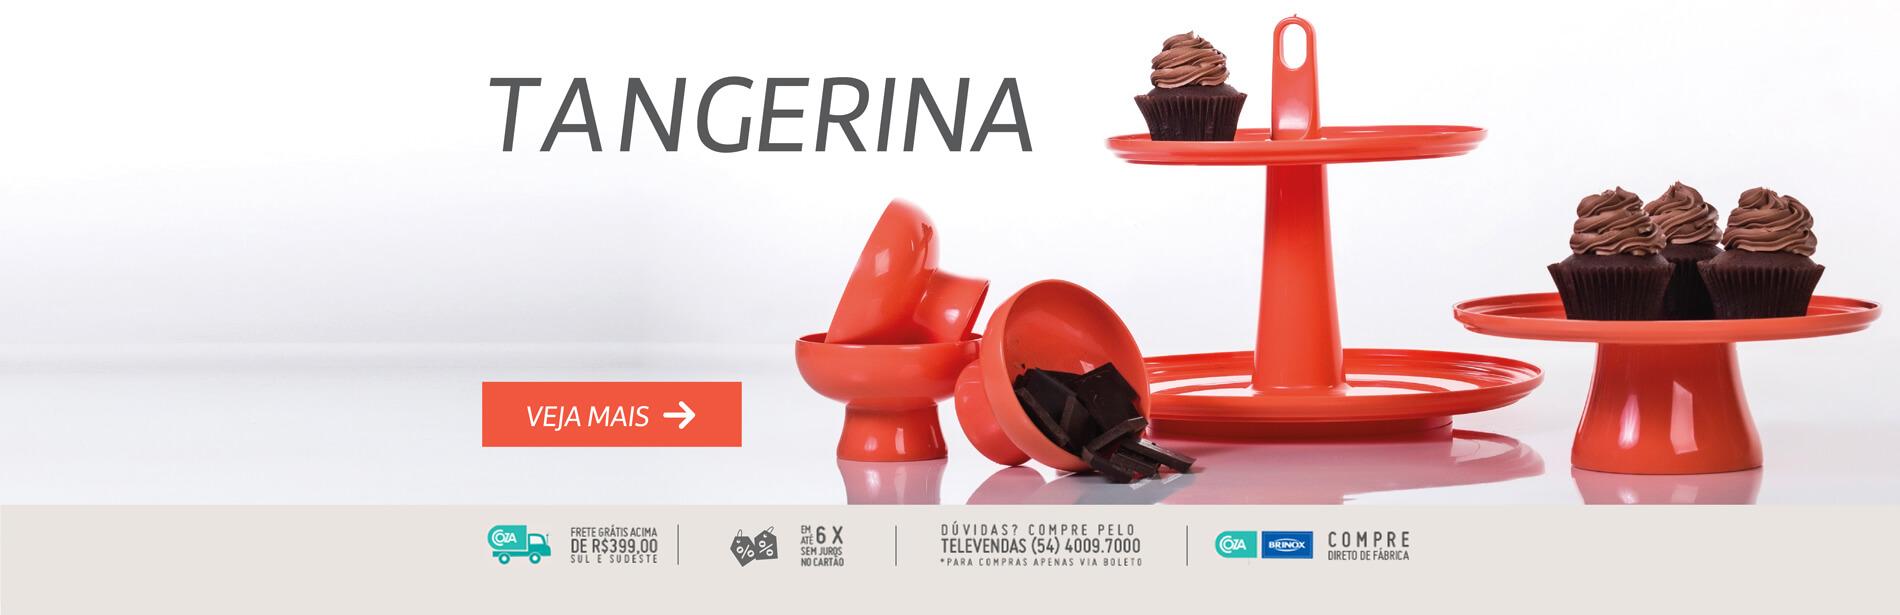 Tangerina II